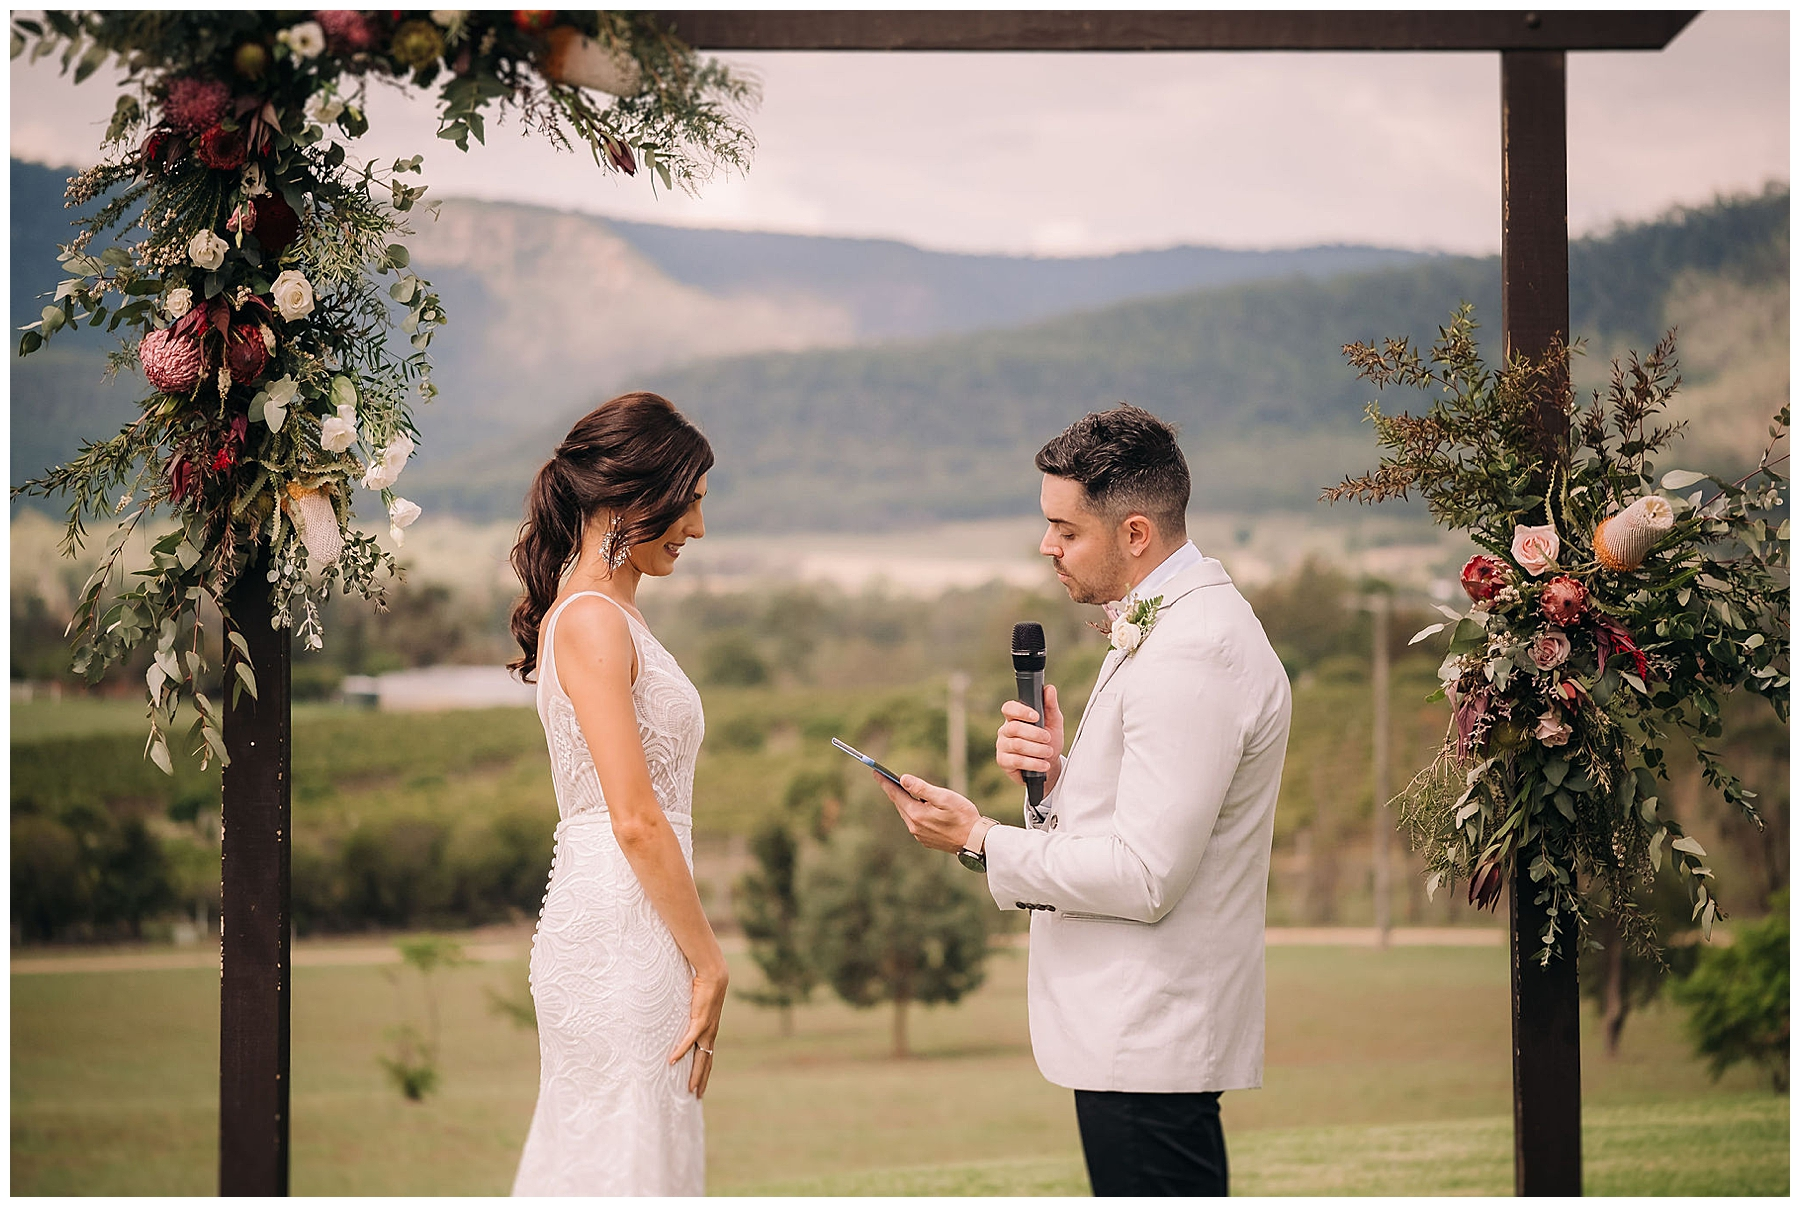 Adam's Peak Wedding Photos + Popcorn Photography_0026.jpg